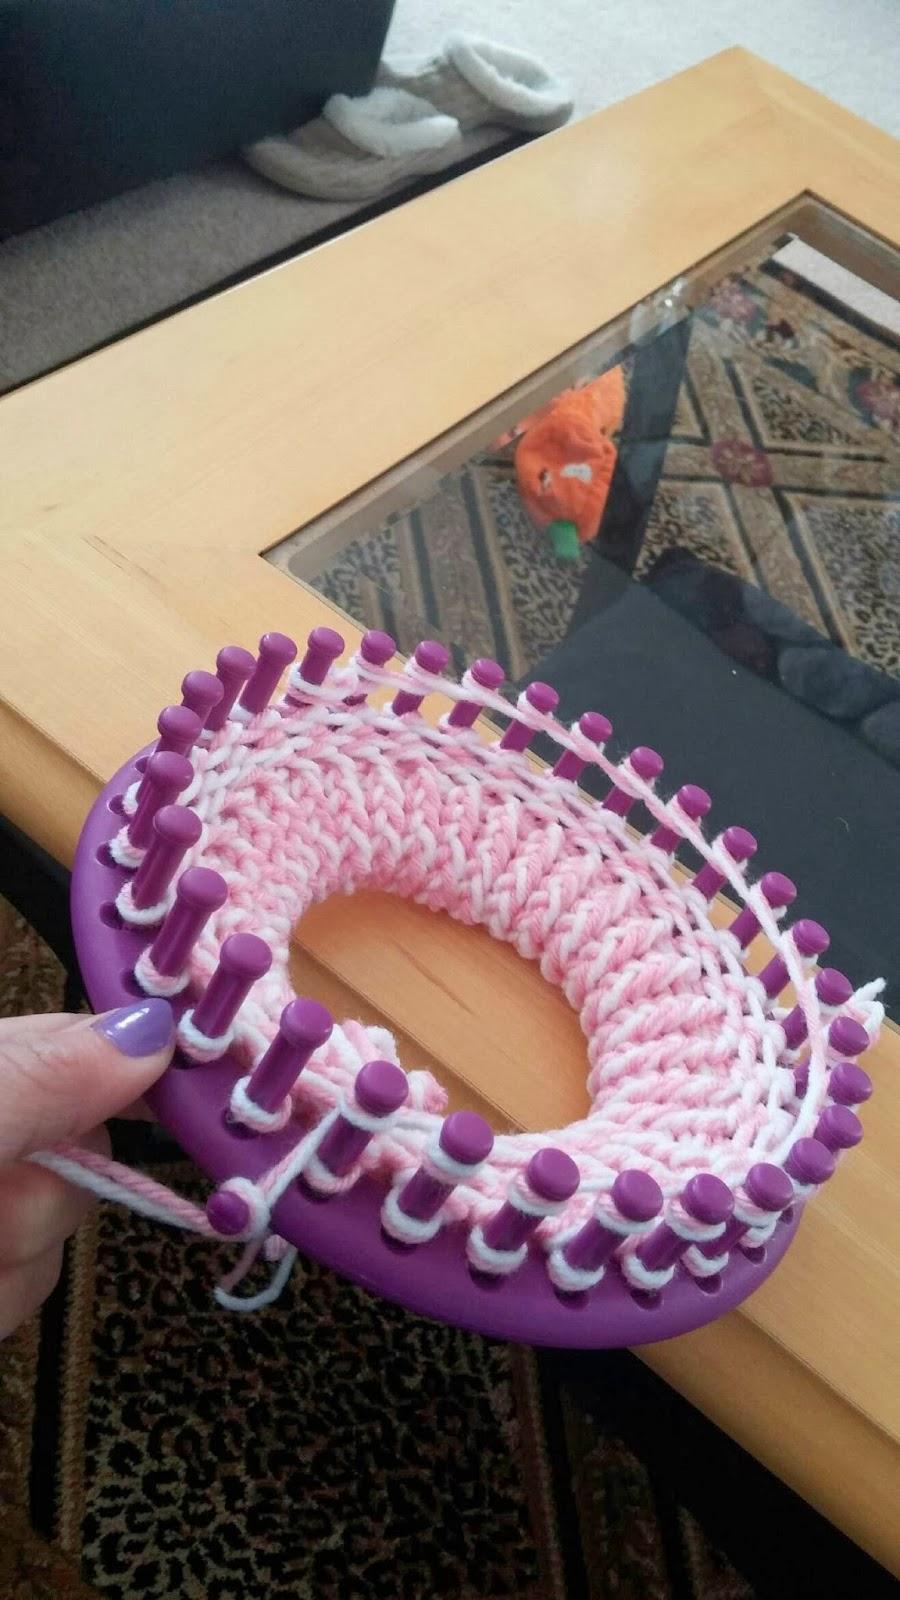 Corky Crafts & Knit Hats: Loom Knitting a Dog Sweater